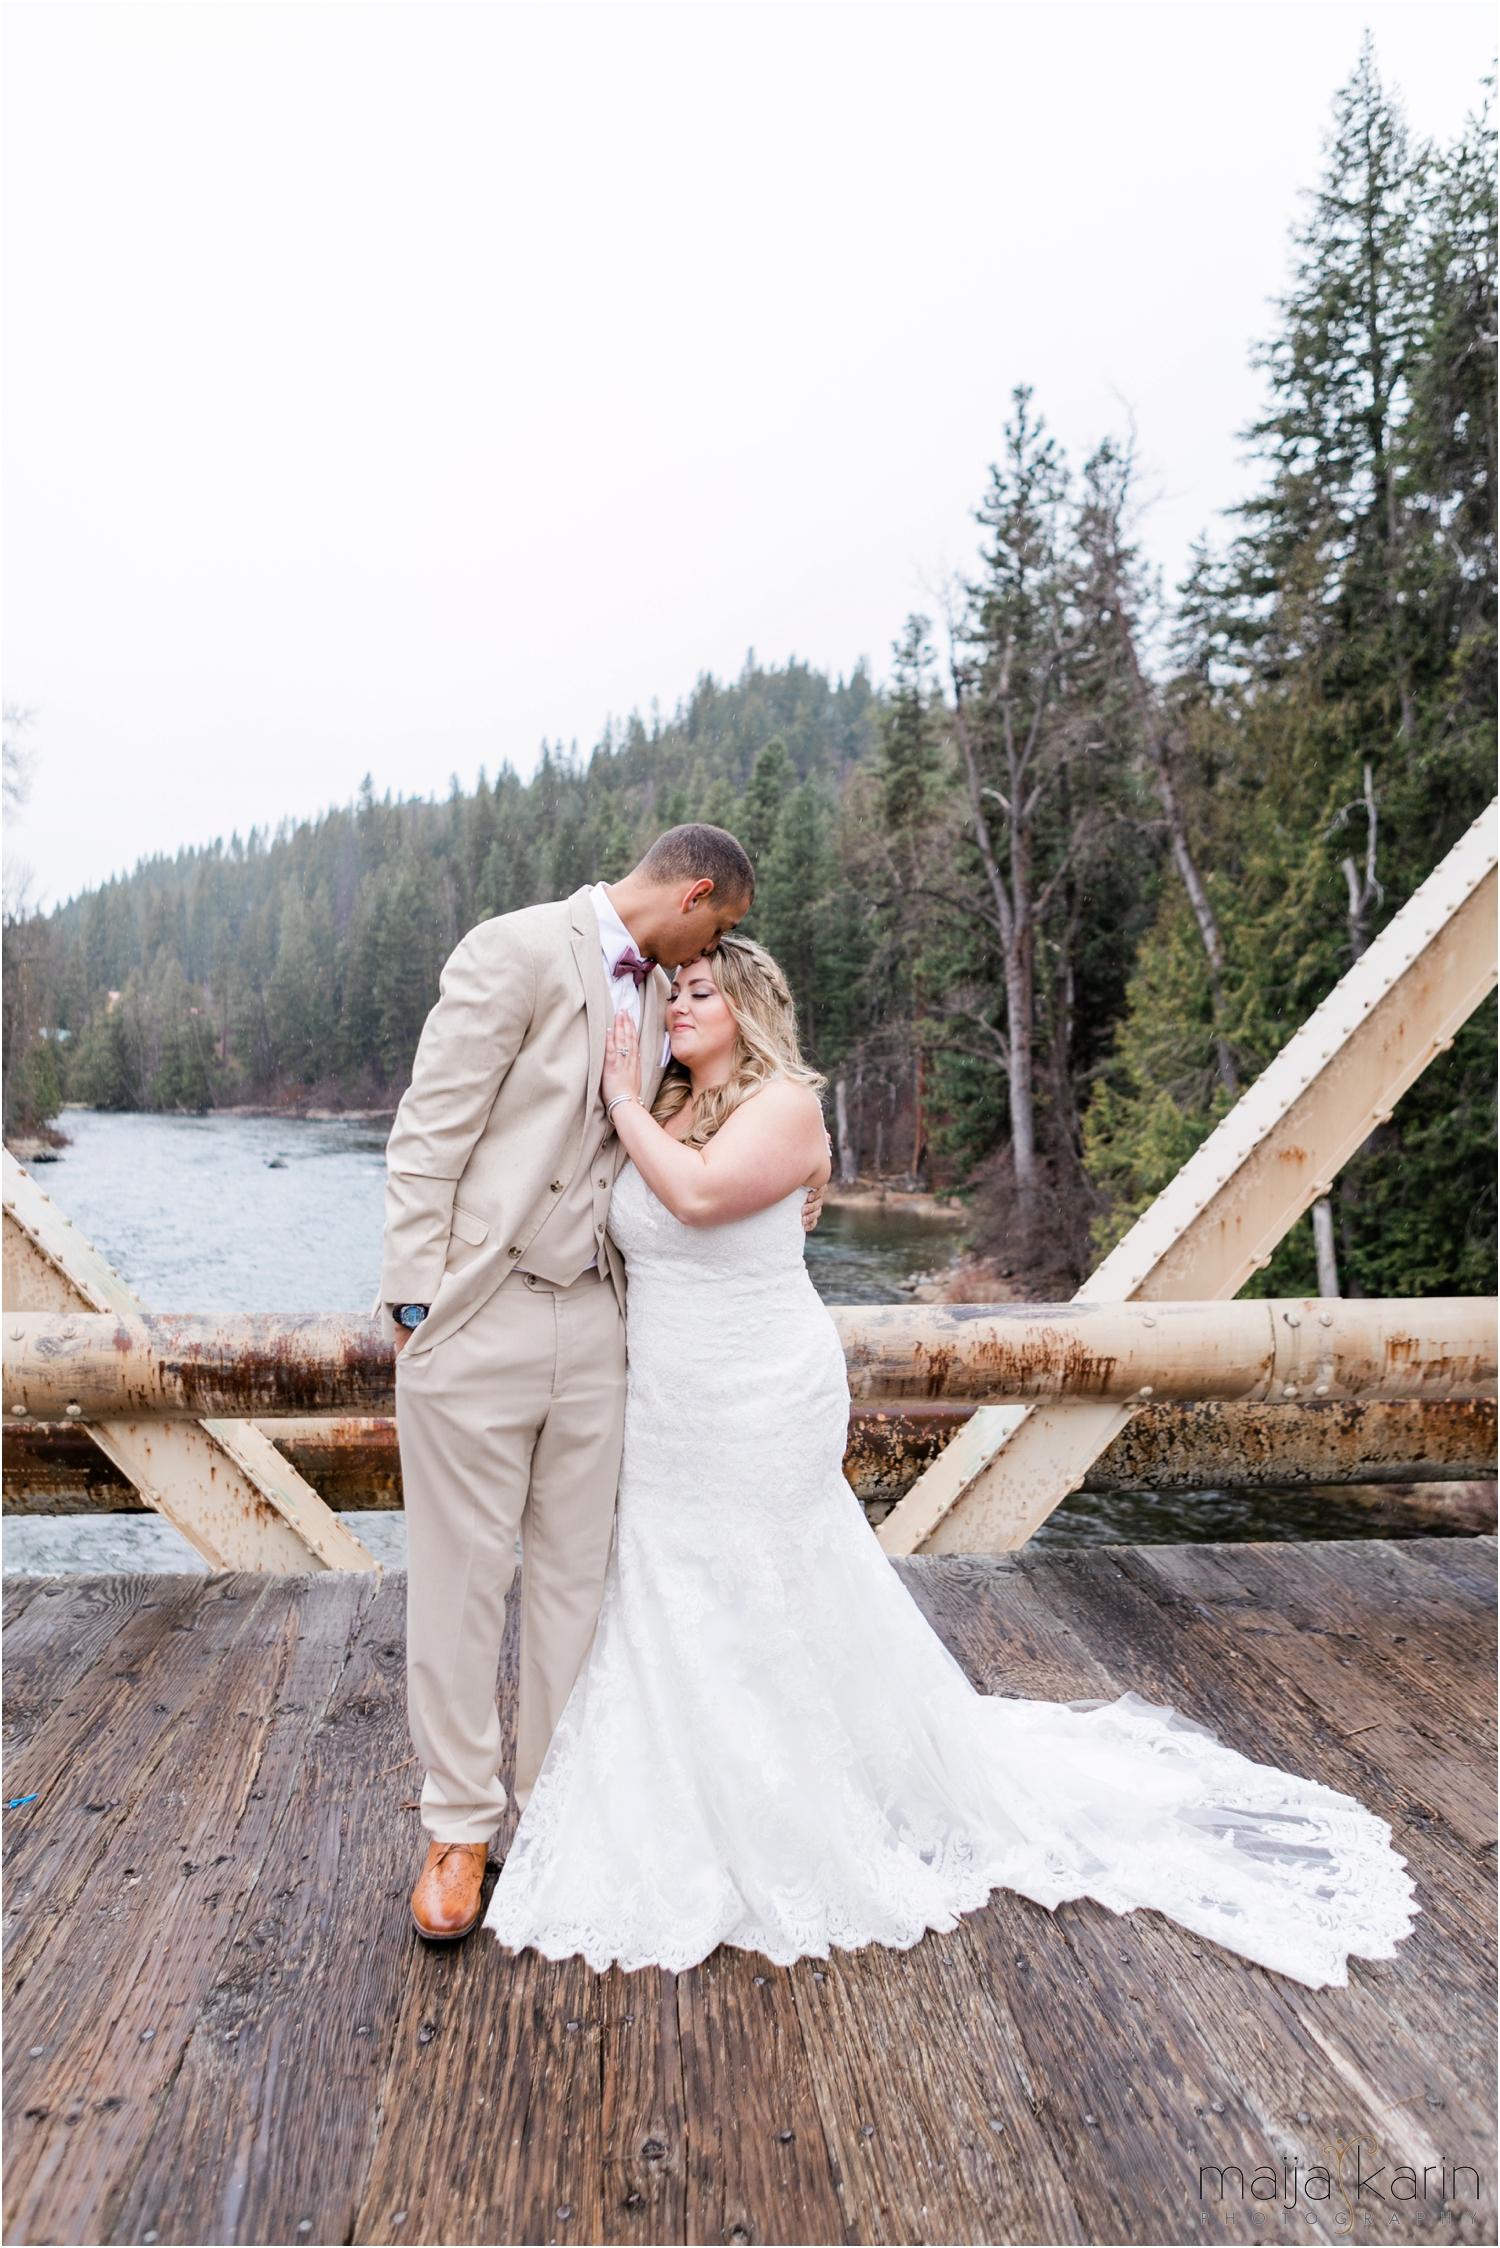 Mountain Springs Lodge wedding Maija Karin Photography%0DMaija Karin Photography%0DMaija Karin Photography%0DMountain-Springs-Lodge-Wedding-Maija-Karin-Photography_0020.jpg